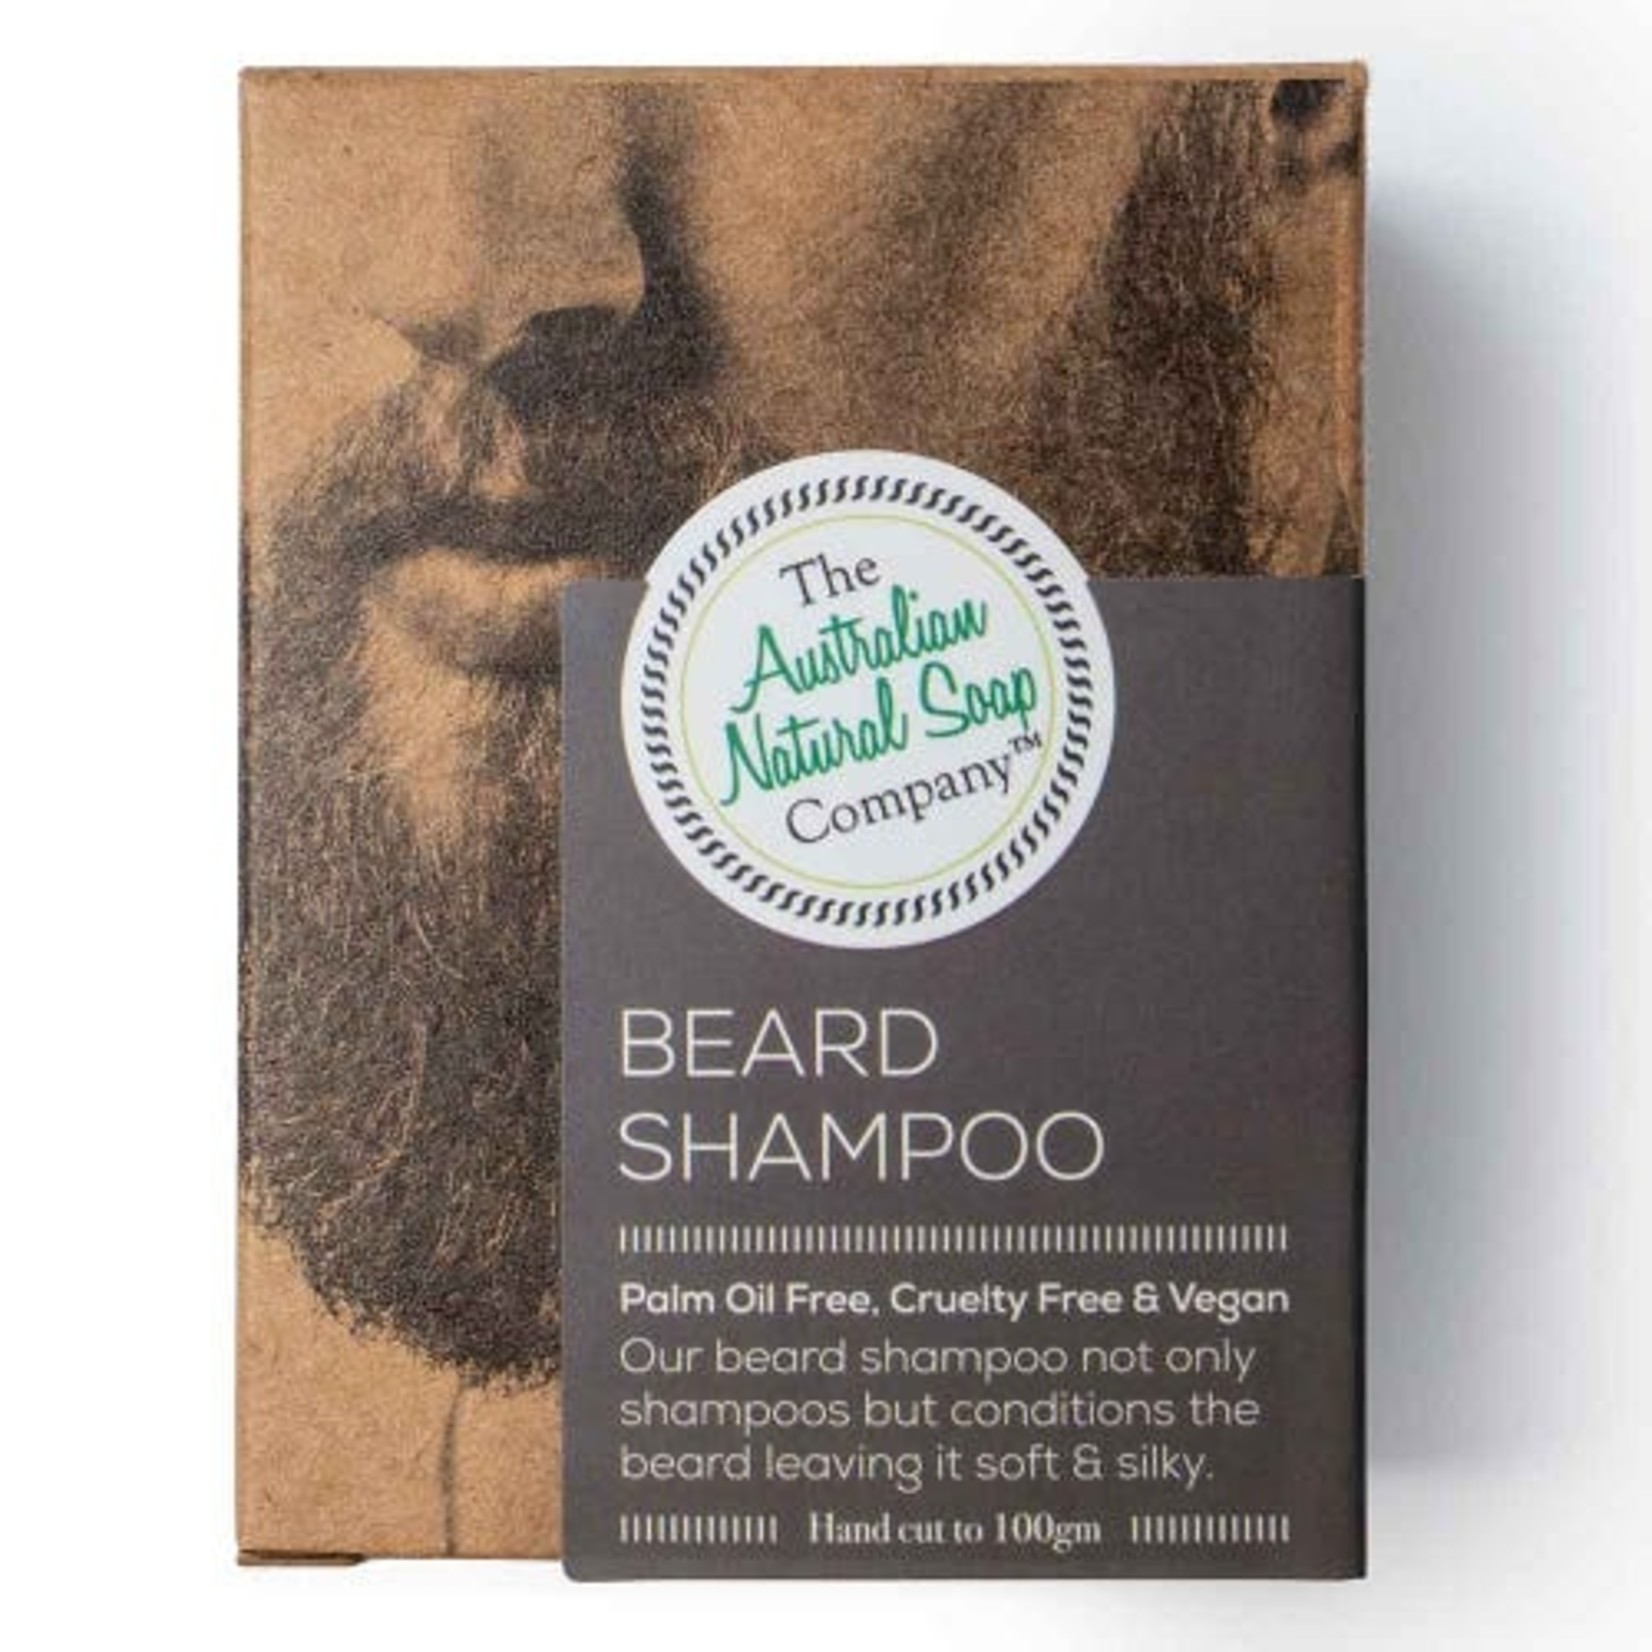 The Australian Natural Soap Company The Australian Natural Soap Company Beard Pack